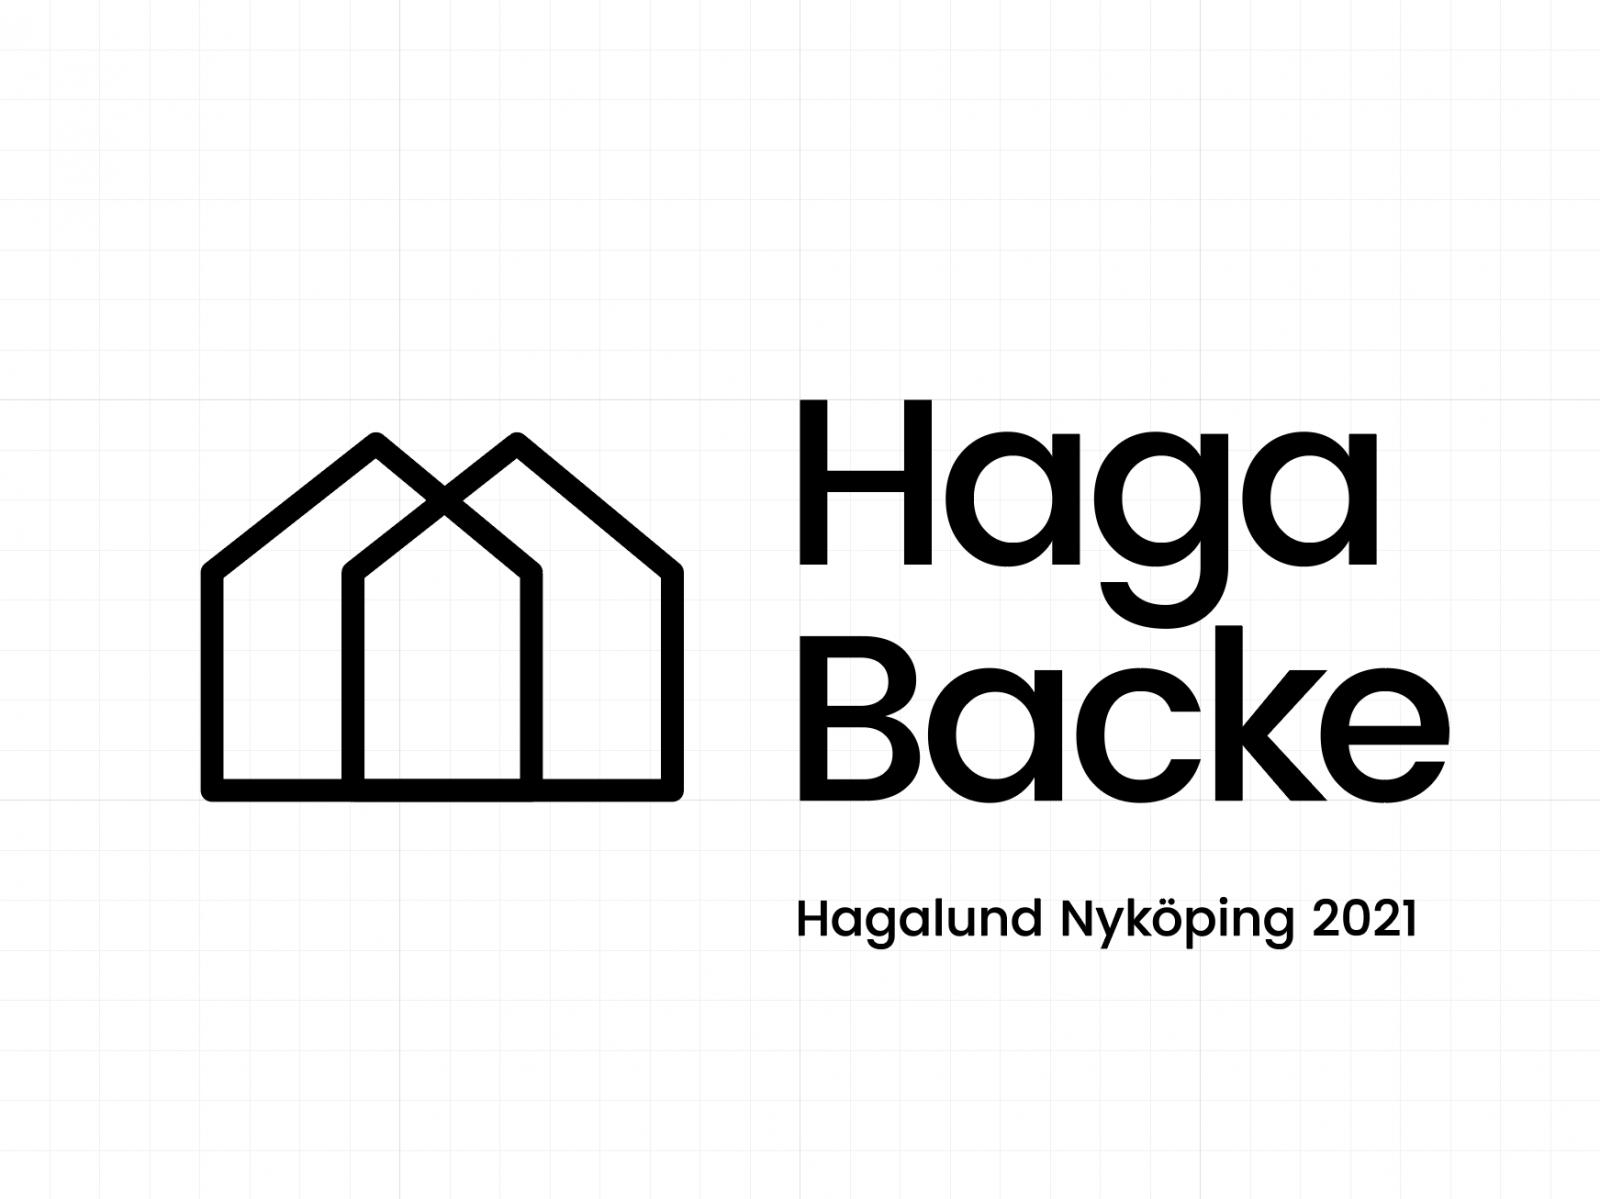 Haga Backe logotyp